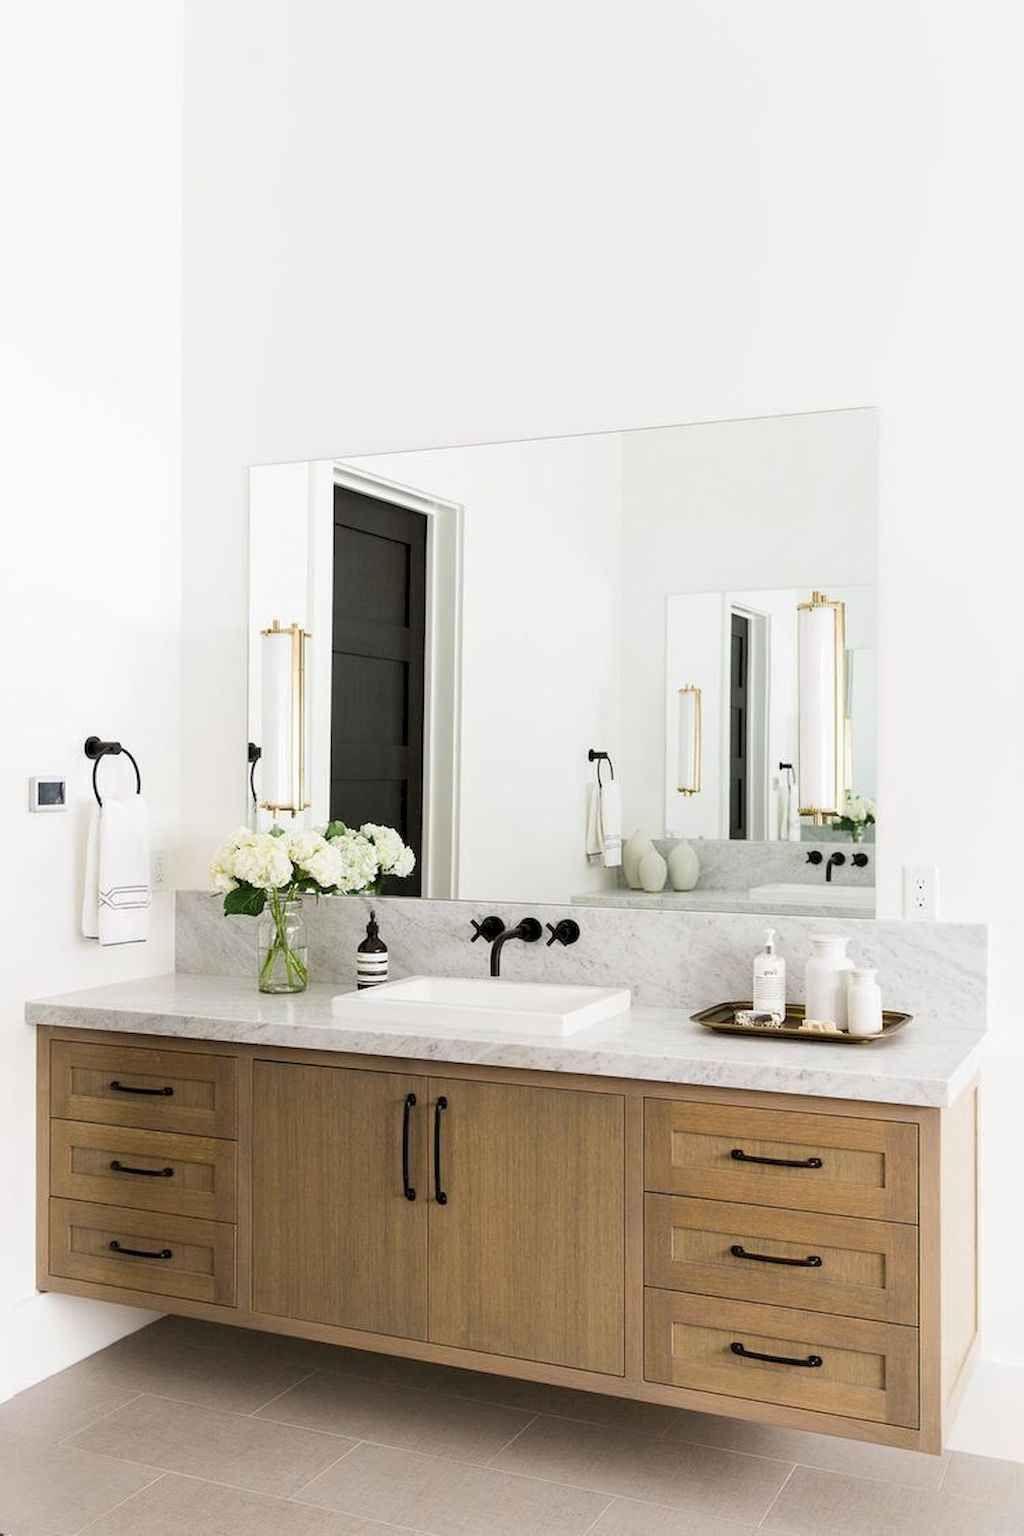 105 Awesome Modern Farmhouse Bathroom Decor Ideas Moderne